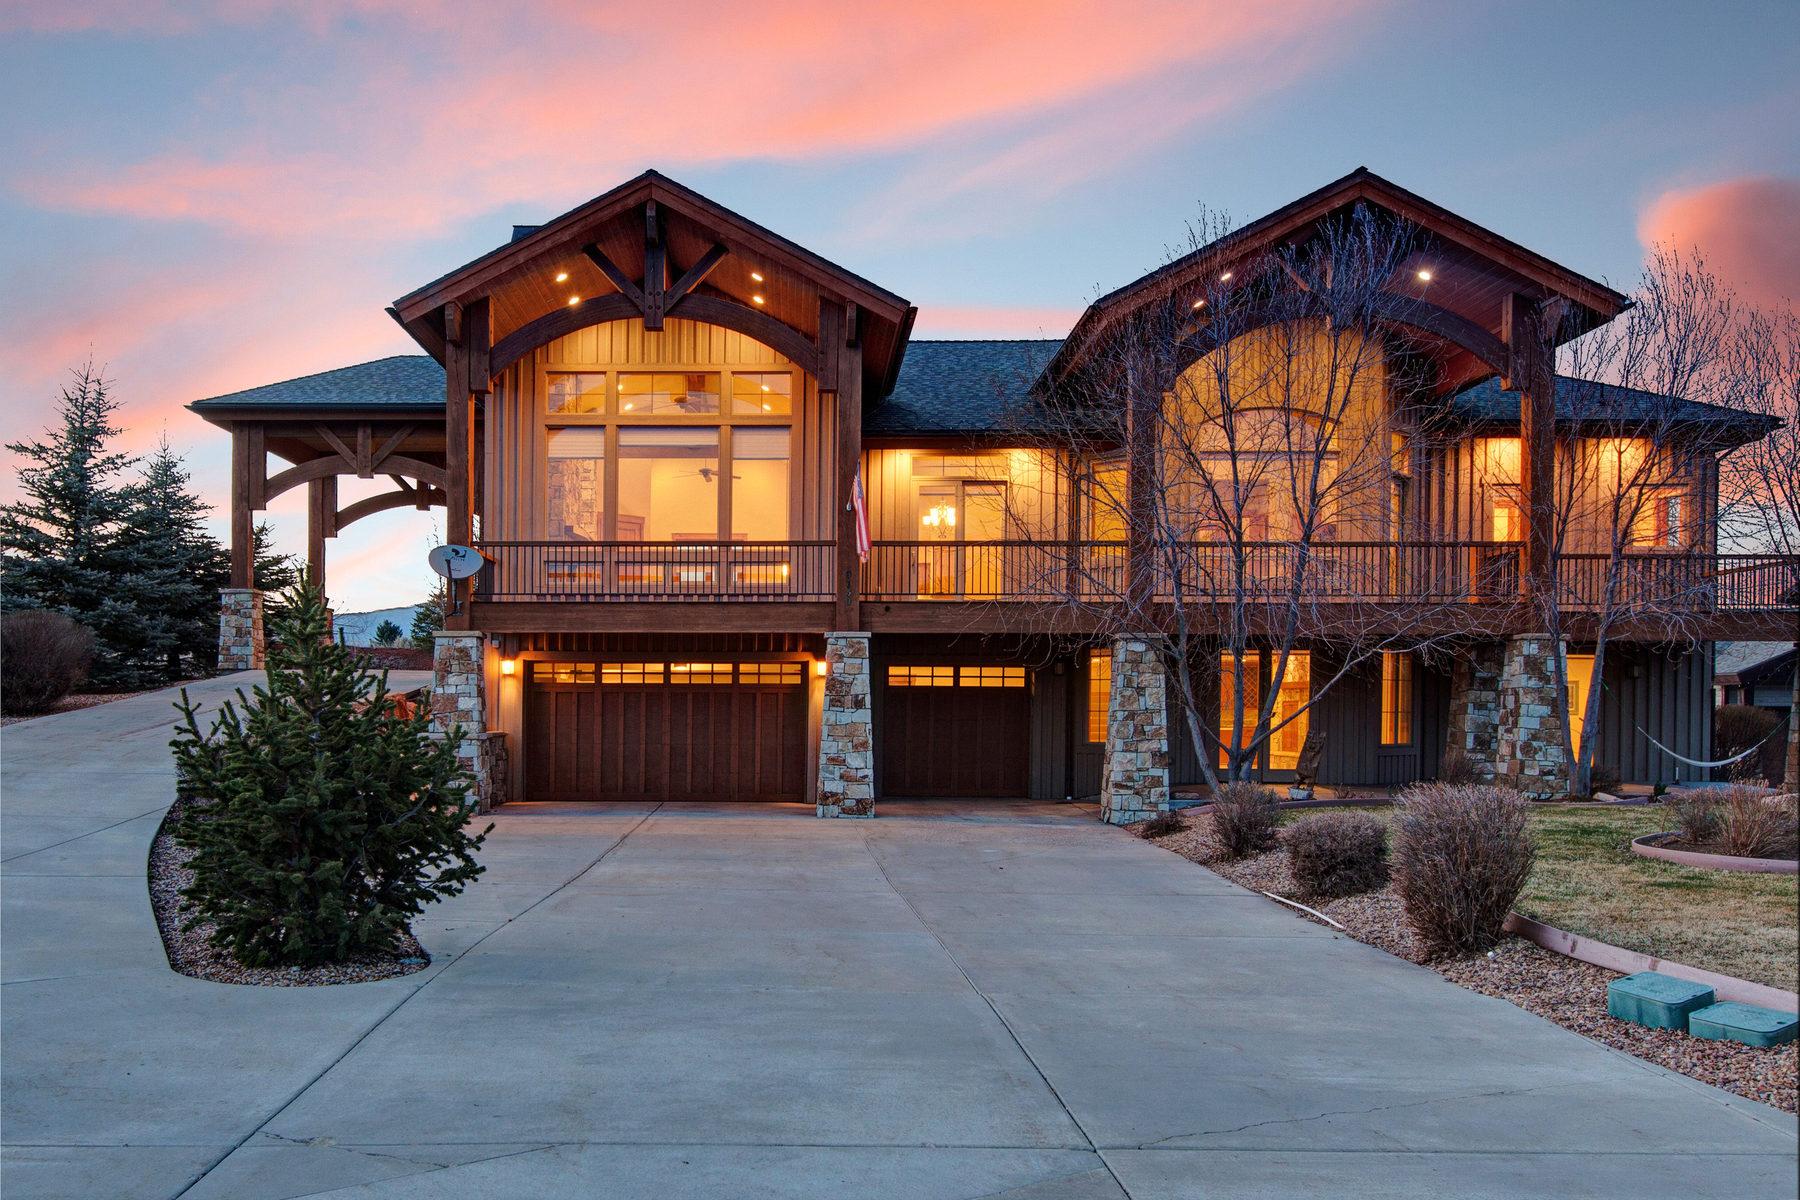 Casa Unifamiliar por un Venta en Mountain Living That Will Please All 6130 Trailside Dr Park City, Utah 84098 Estados Unidos